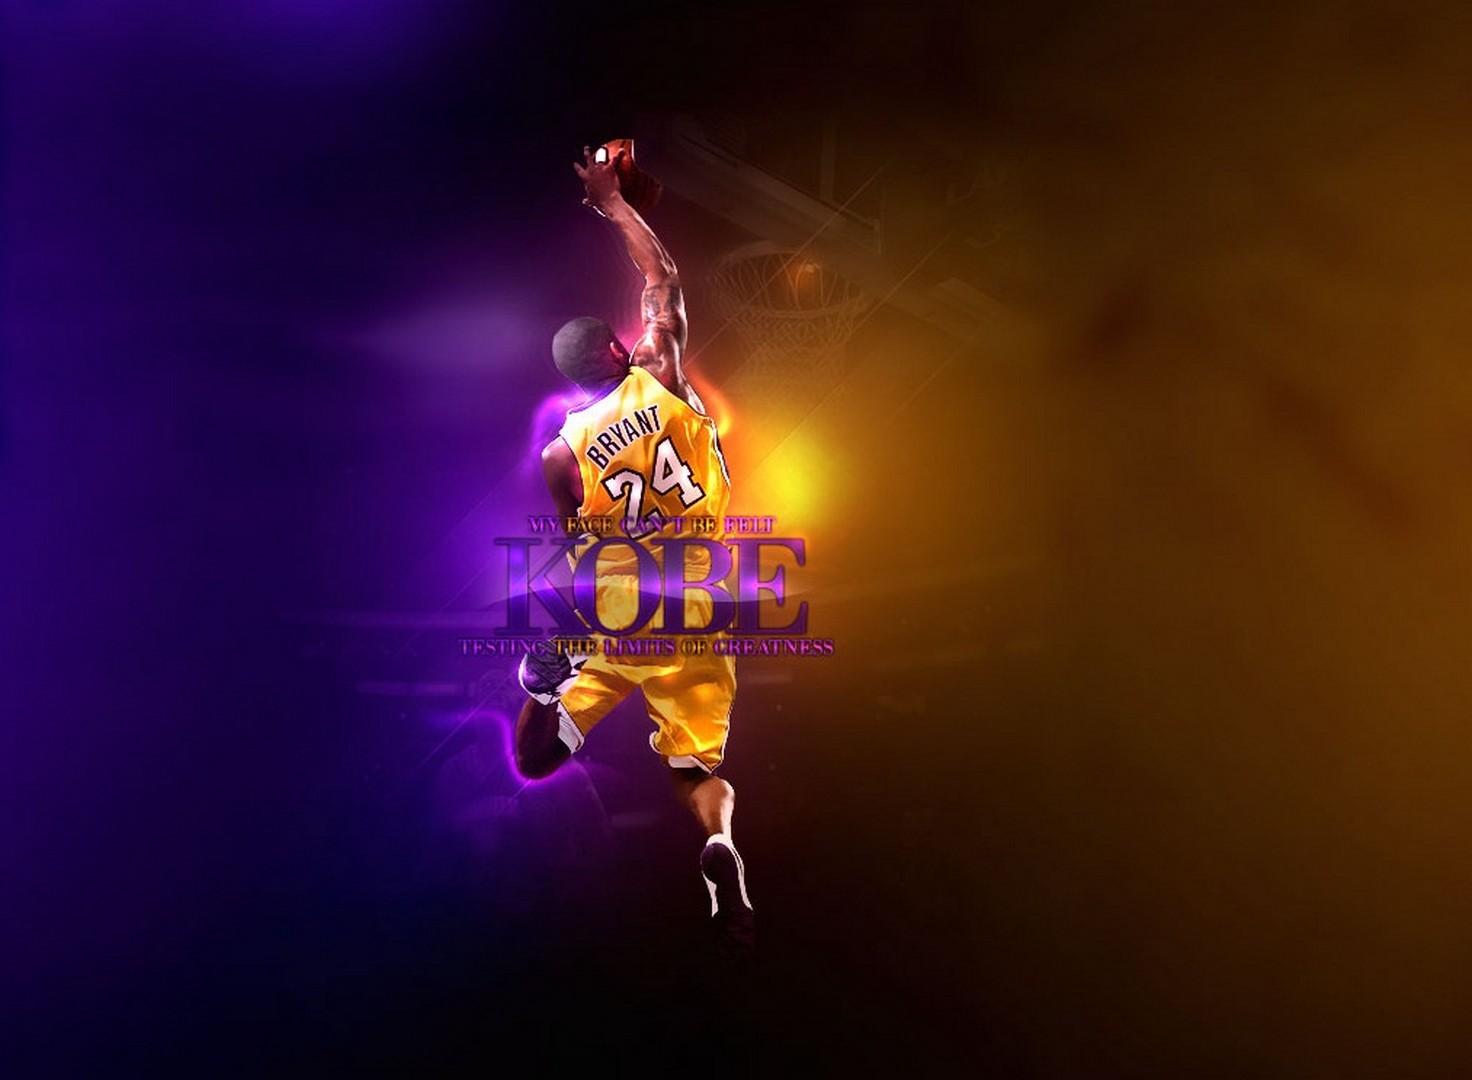 Trade Rumors Kobe Bryant Dunk NBA Wallpaper Big Fan of NBA   Daily 1472x1080